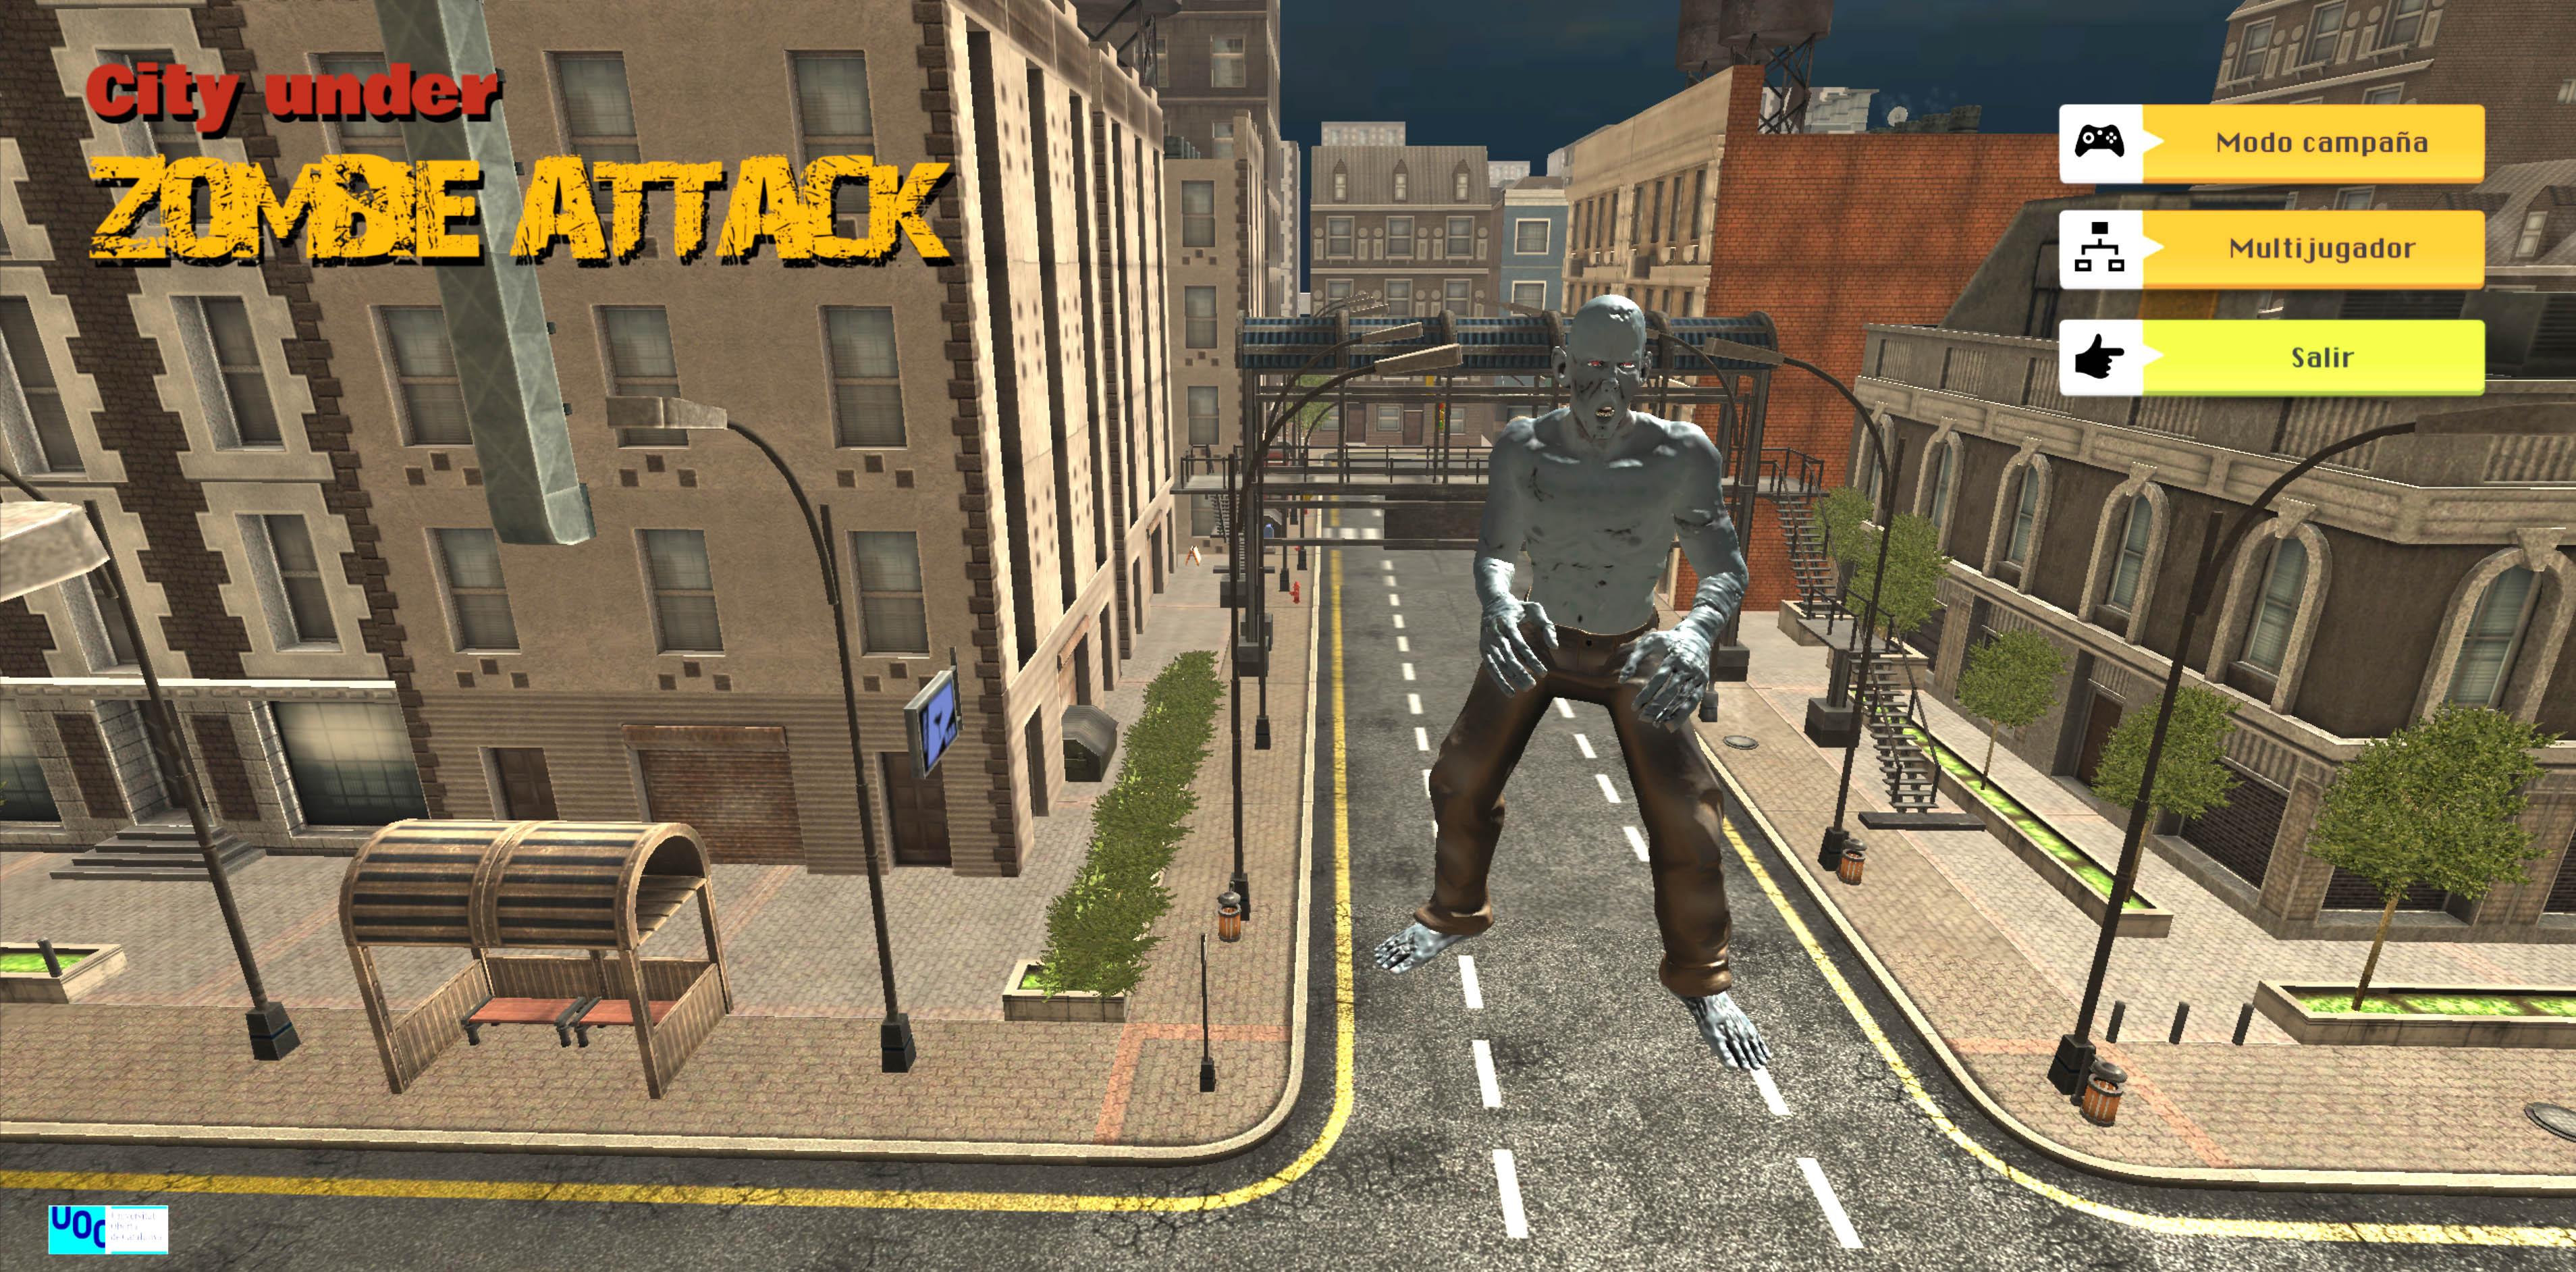 City under zombie attack (CUZA)